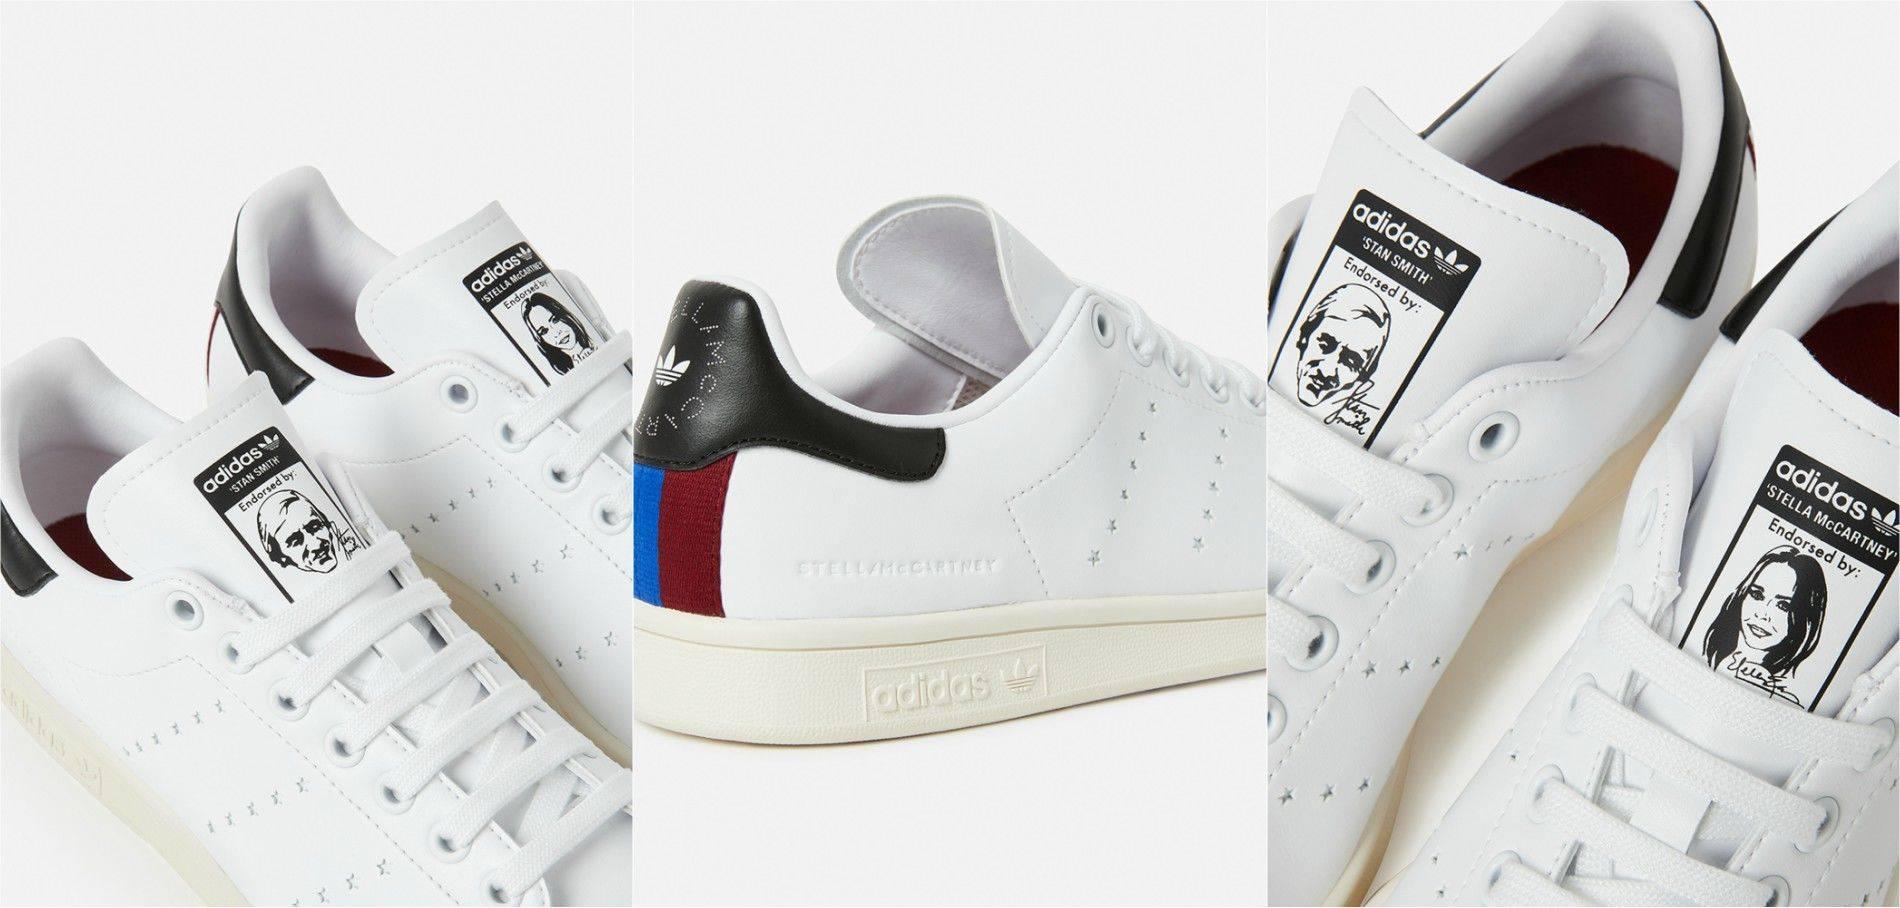 Acheter Adidas By Stella McCartney Aux Prix Très Abordable